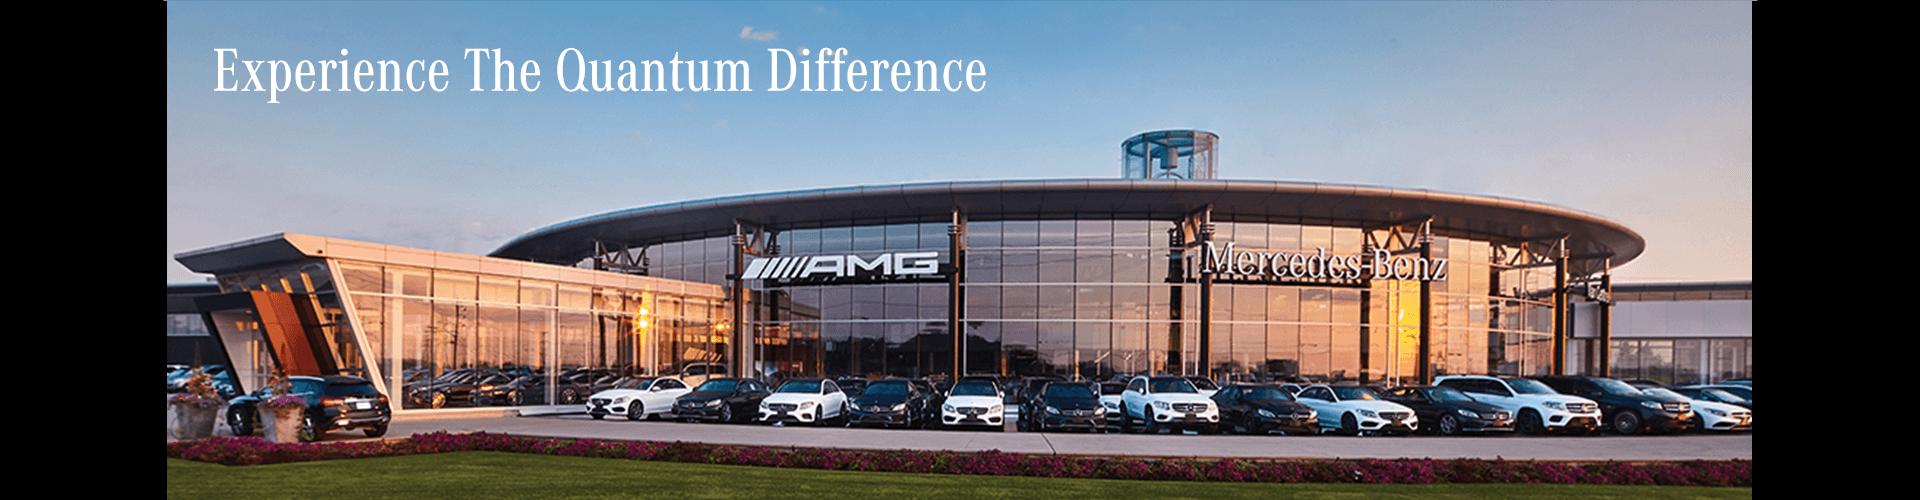 Mercedes-Benz Burlington Experience The Quantum Difference